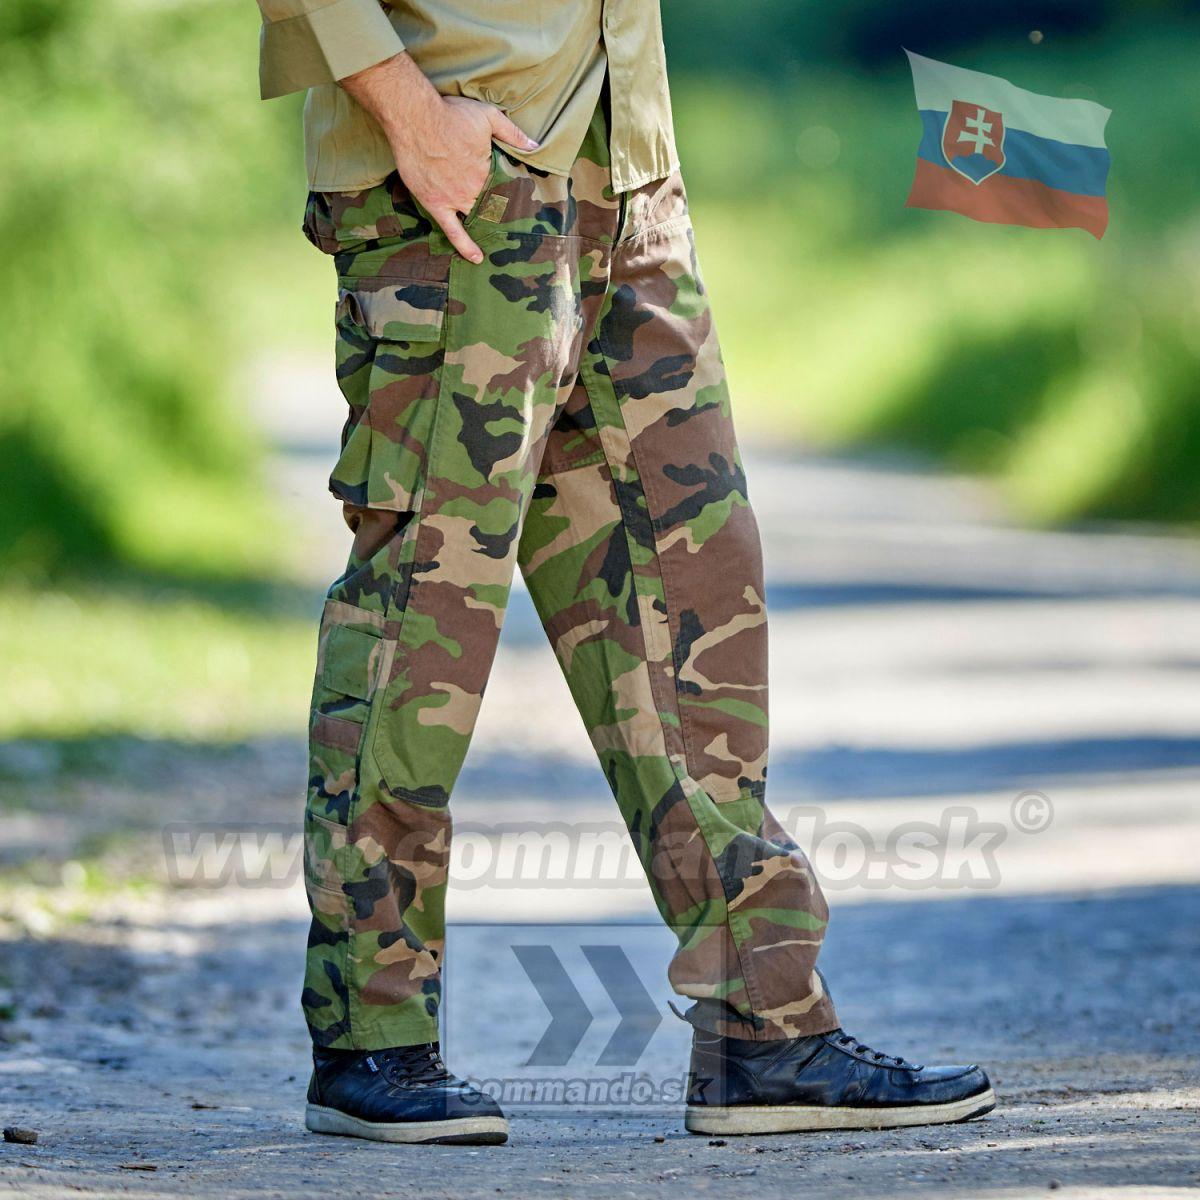 897260ebe Slovenské armádne nohavice vzor 97 | Commando.sk